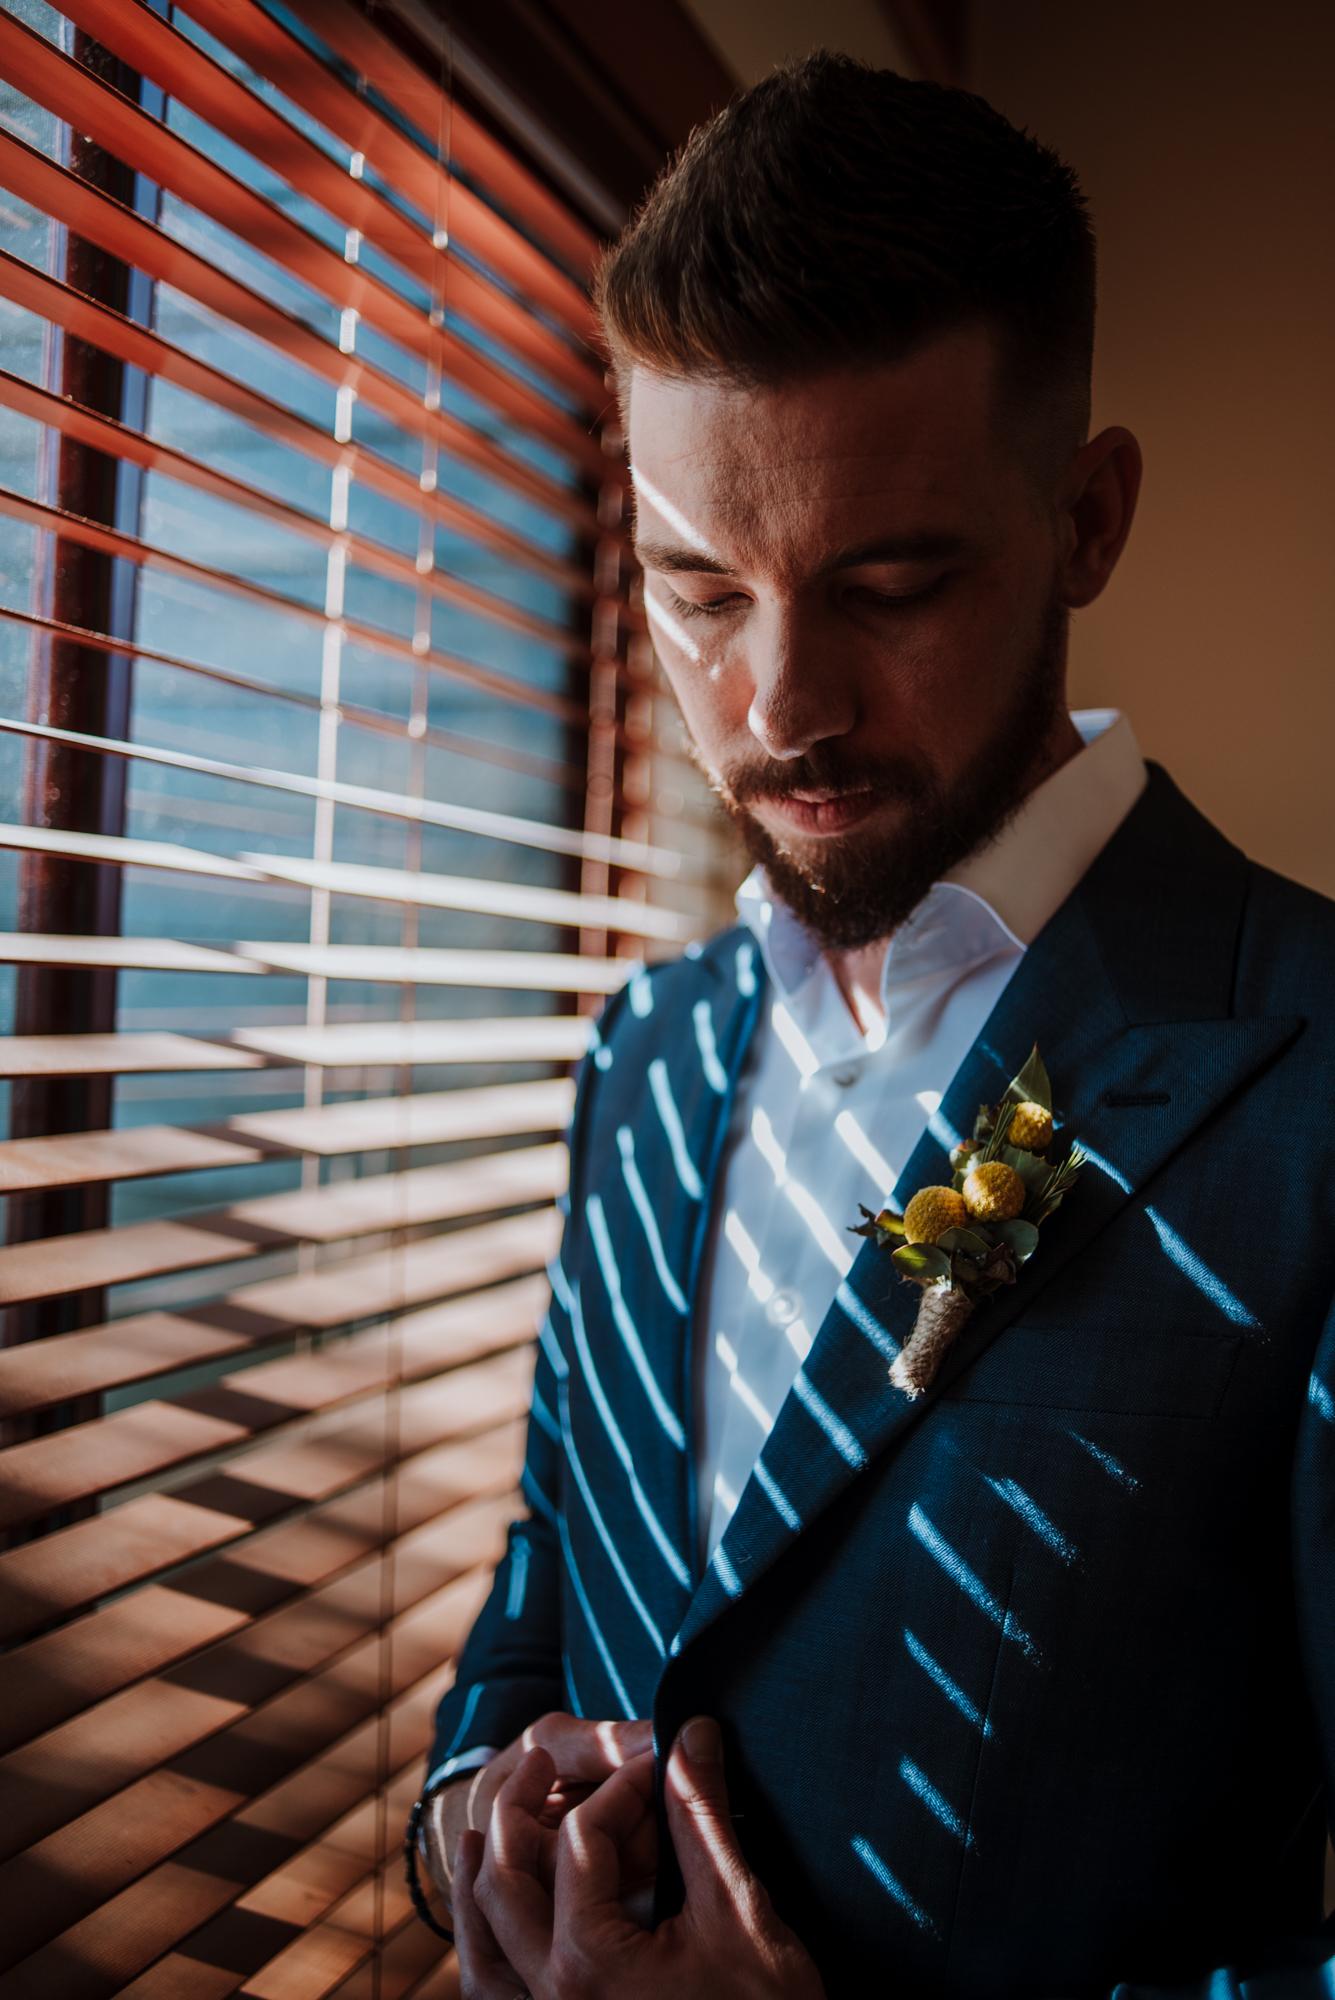 jessica-howard-photography-sean-alessandro-wedding-day-web-170.jpg